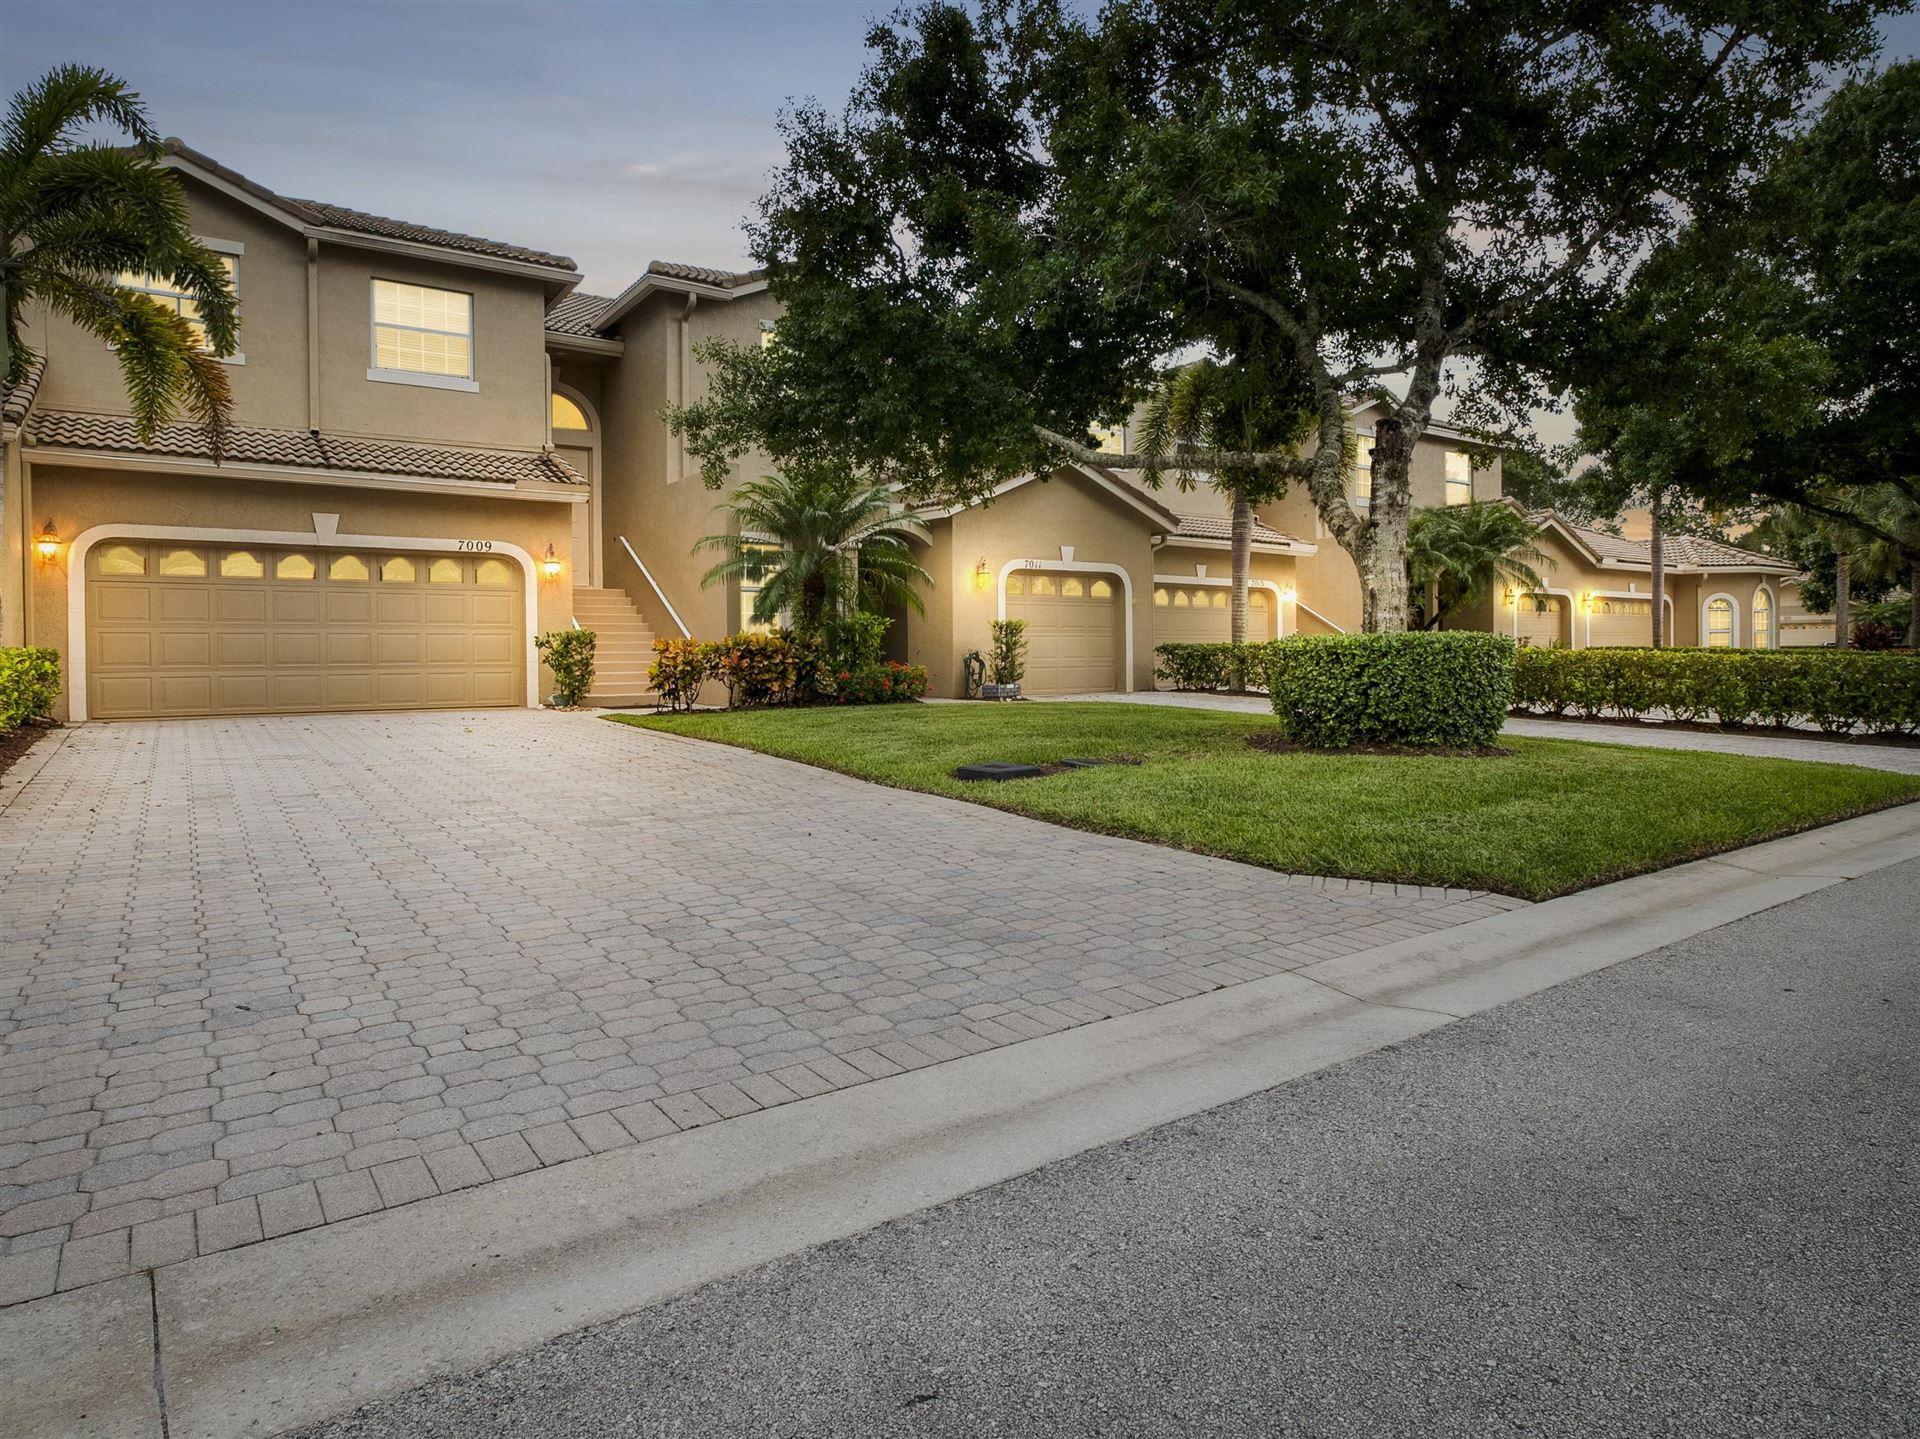 7009 Torrey Pines Circle, Port Saint Lucie, FL 34986 - MLS#: RX-10735774